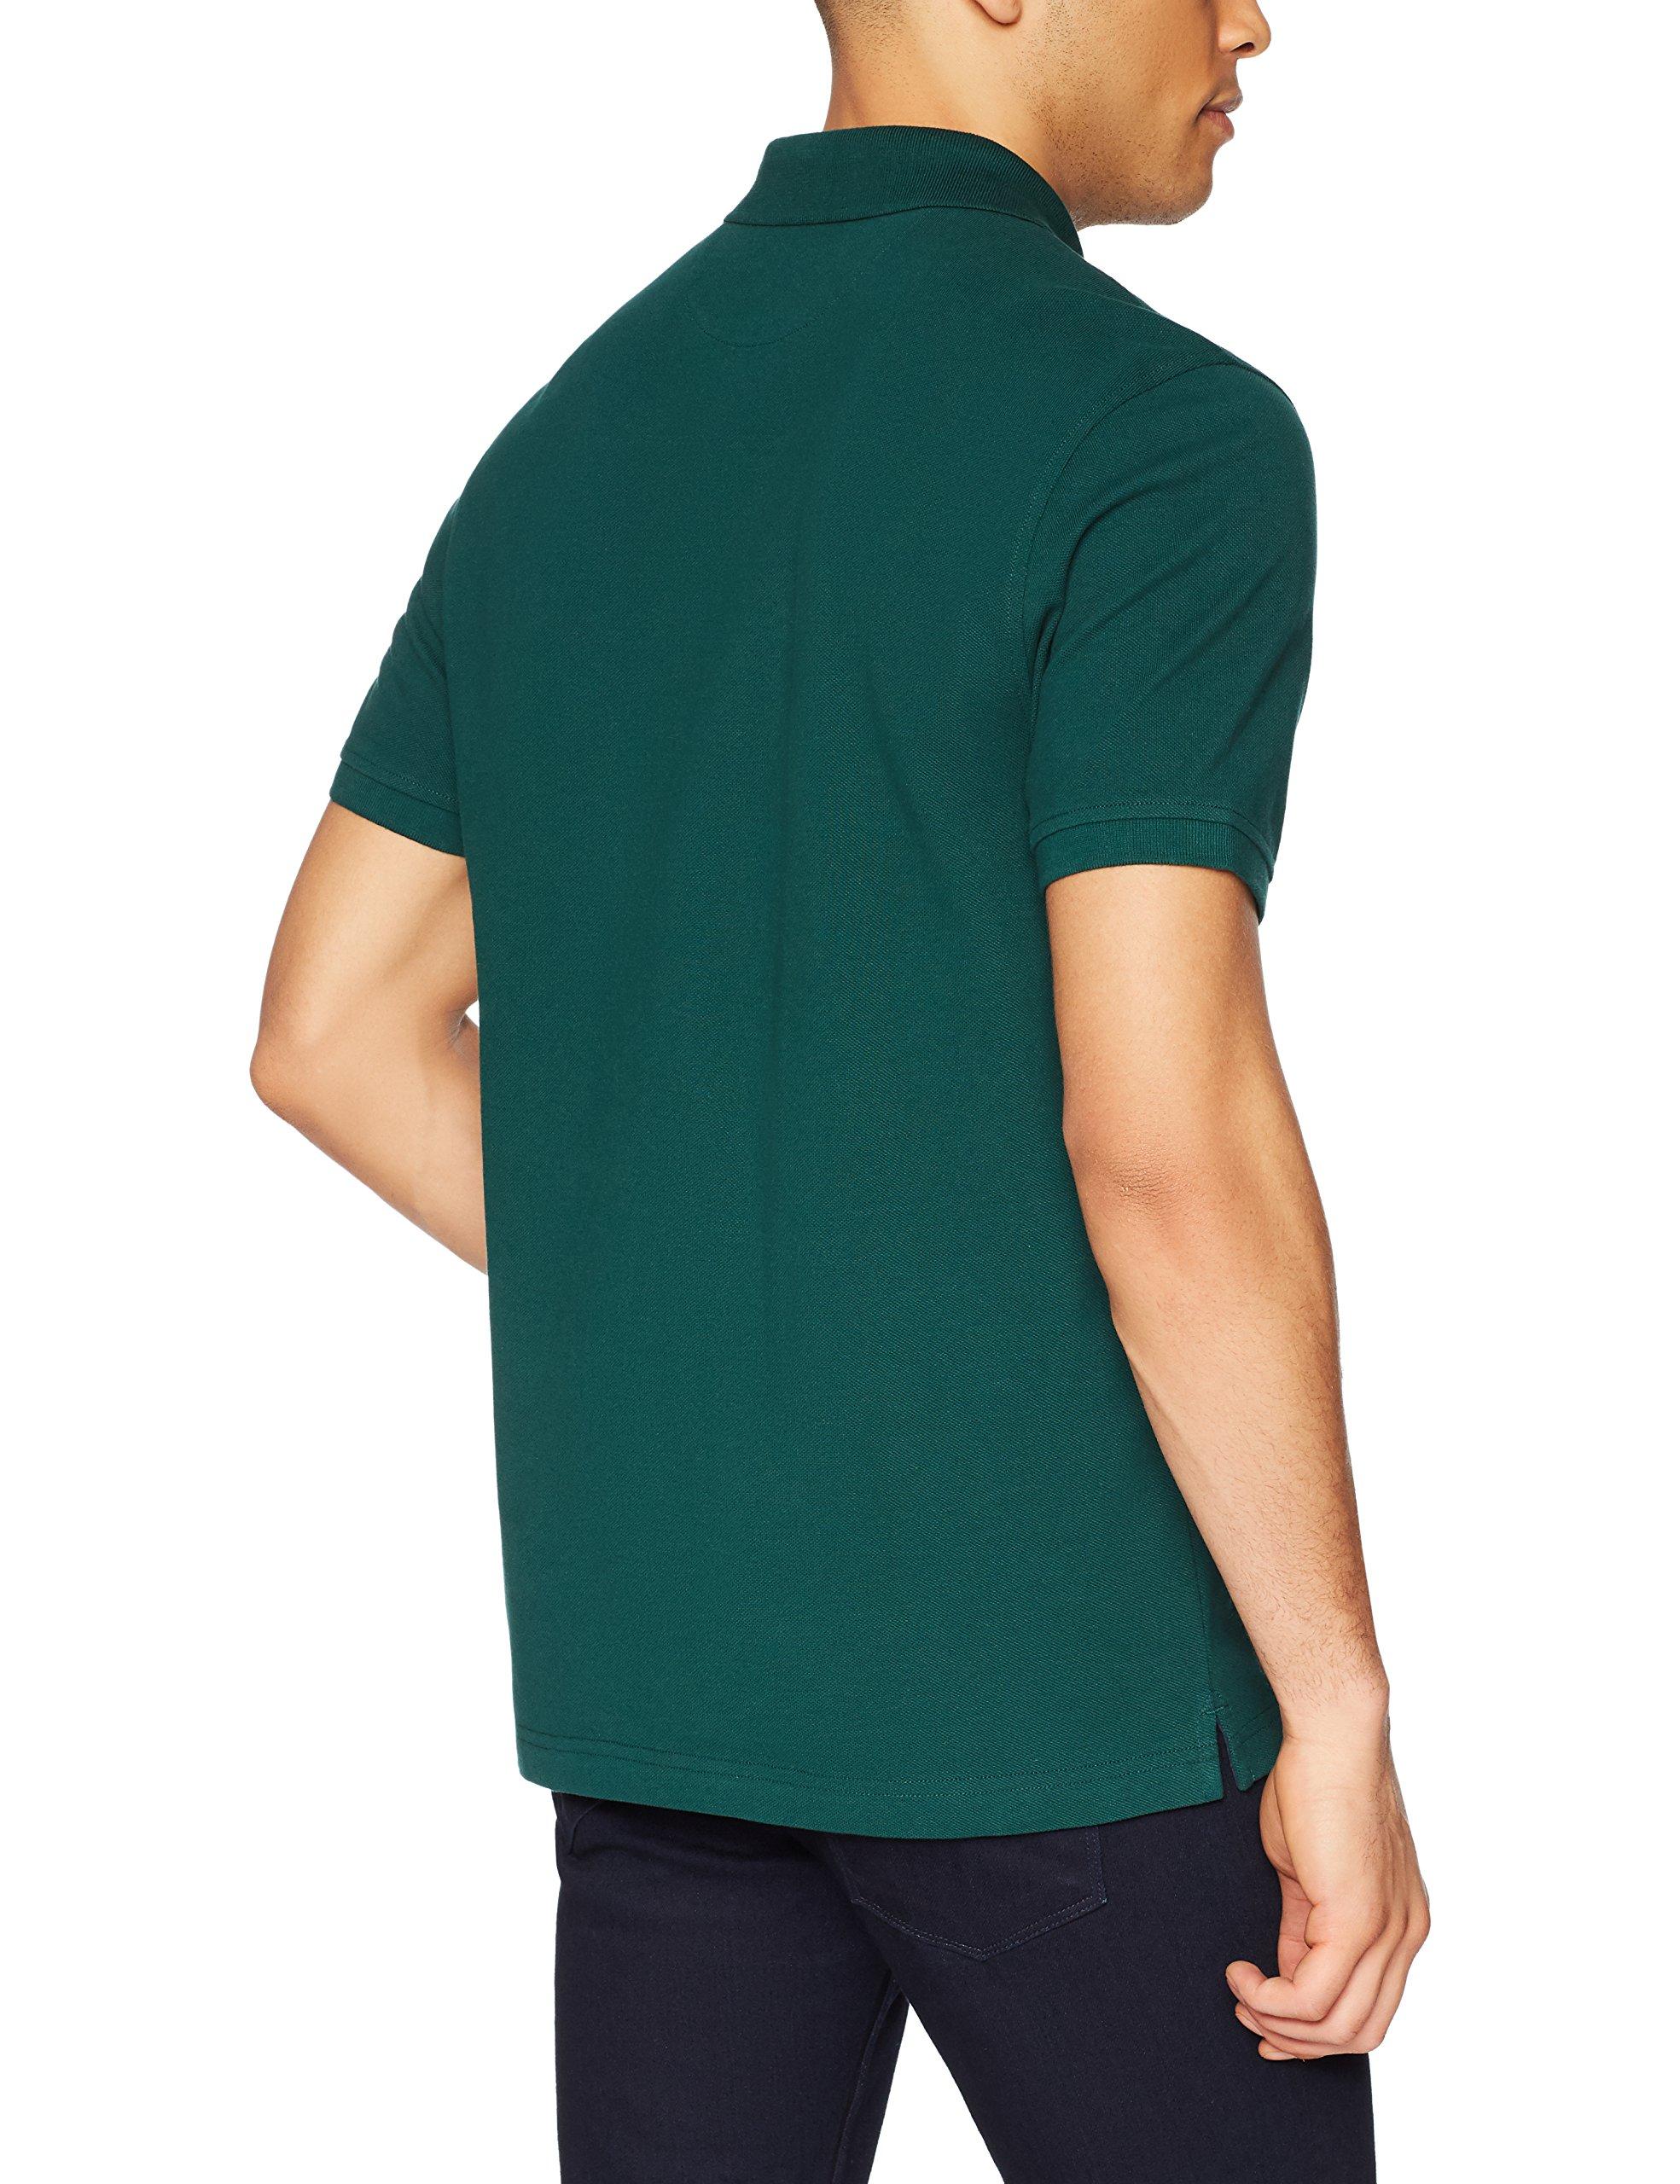 Amazon Essentials Men's Slim-Fit Cotton Pique Polo Shirt, Hunter Green, Large by Amazon Essentials (Image #4)